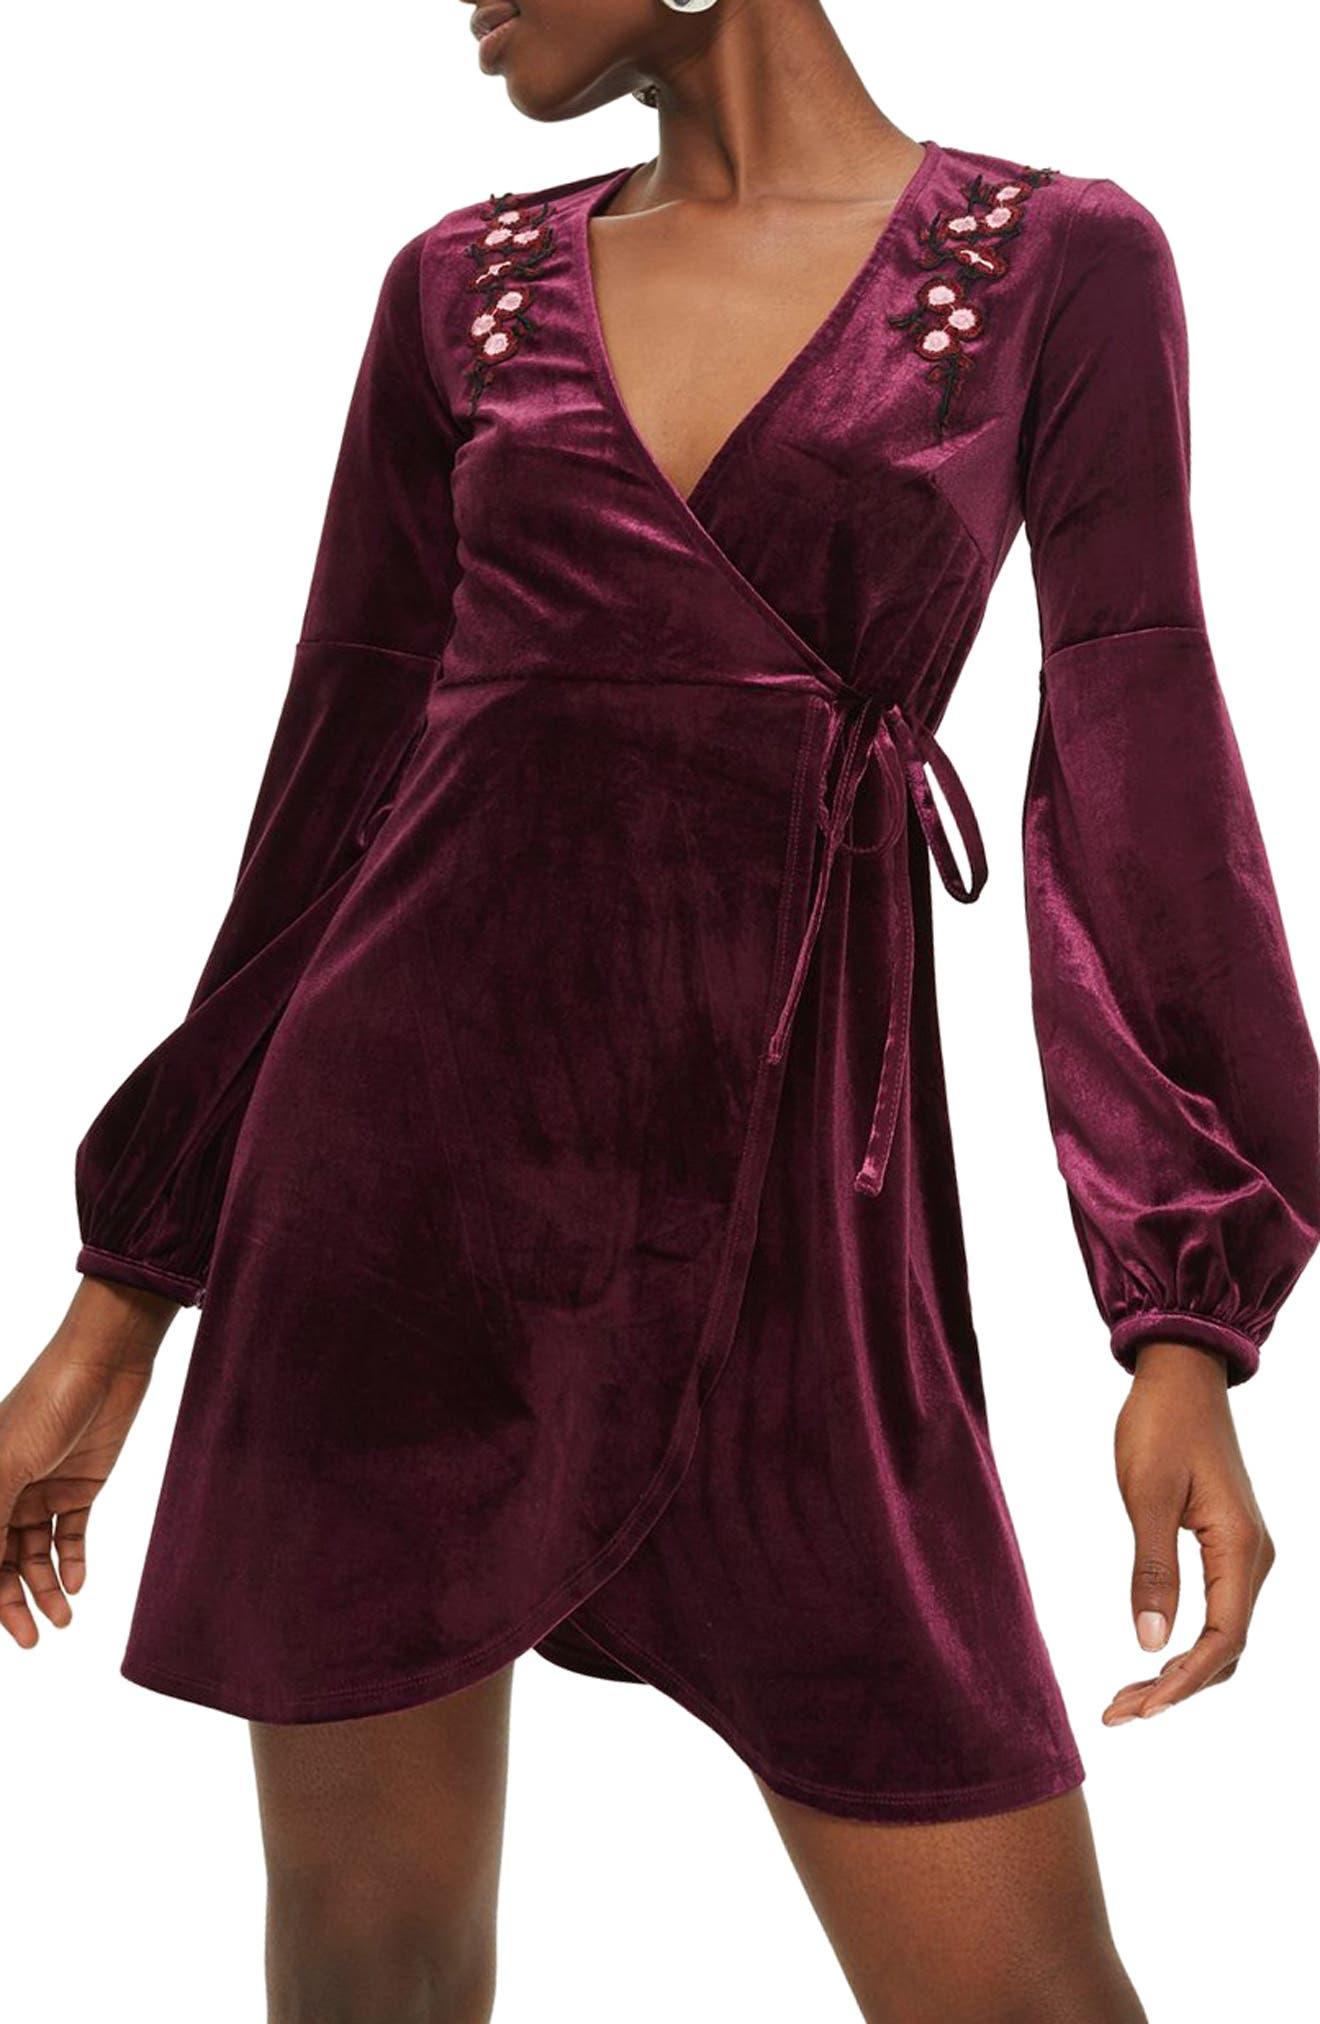 Topshop Embroidered Velvet Wrap Dress